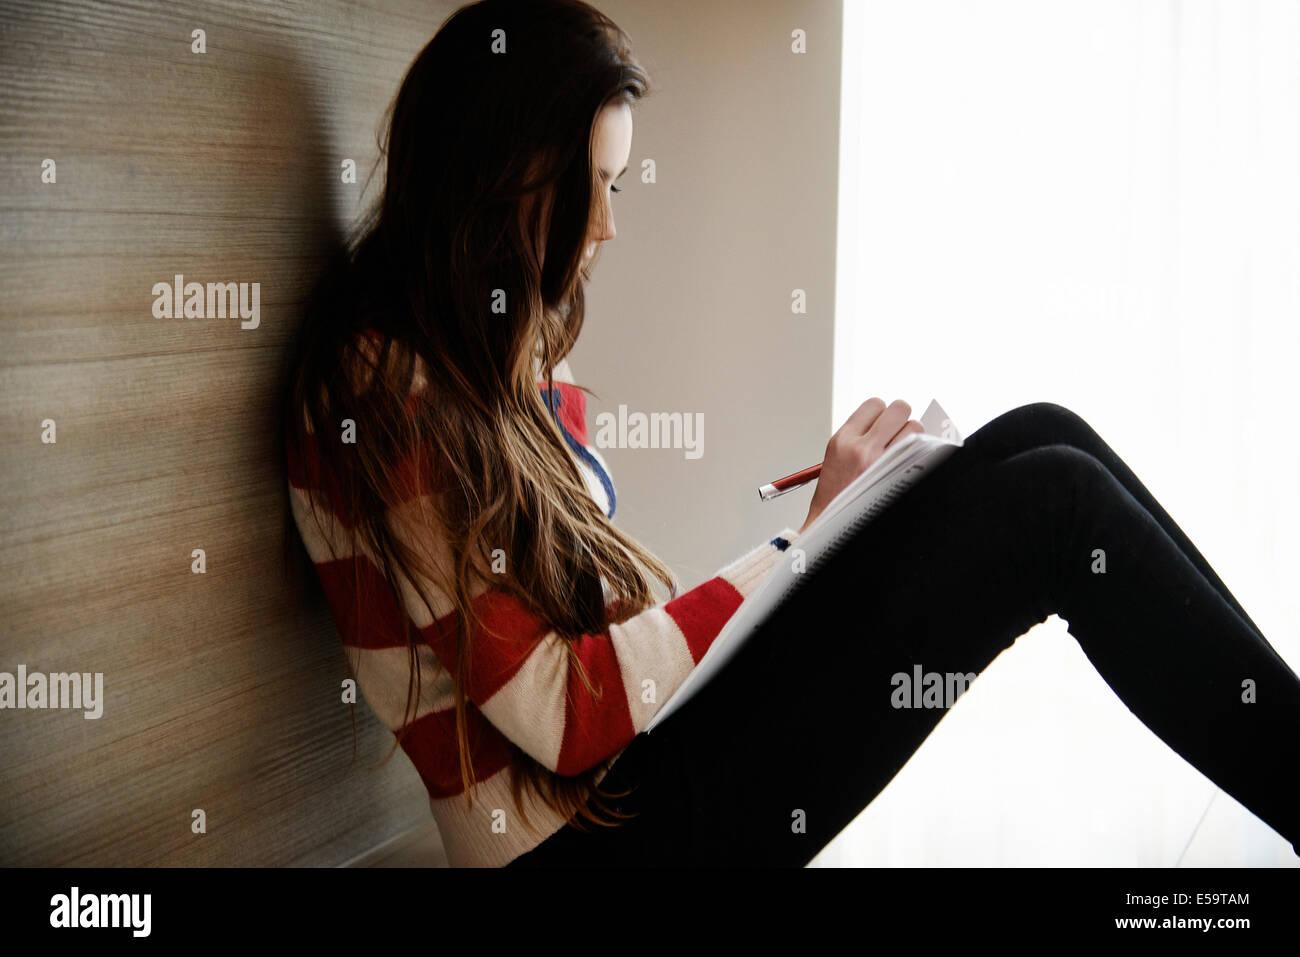 Teenage girl writing in notebook Photo Stock